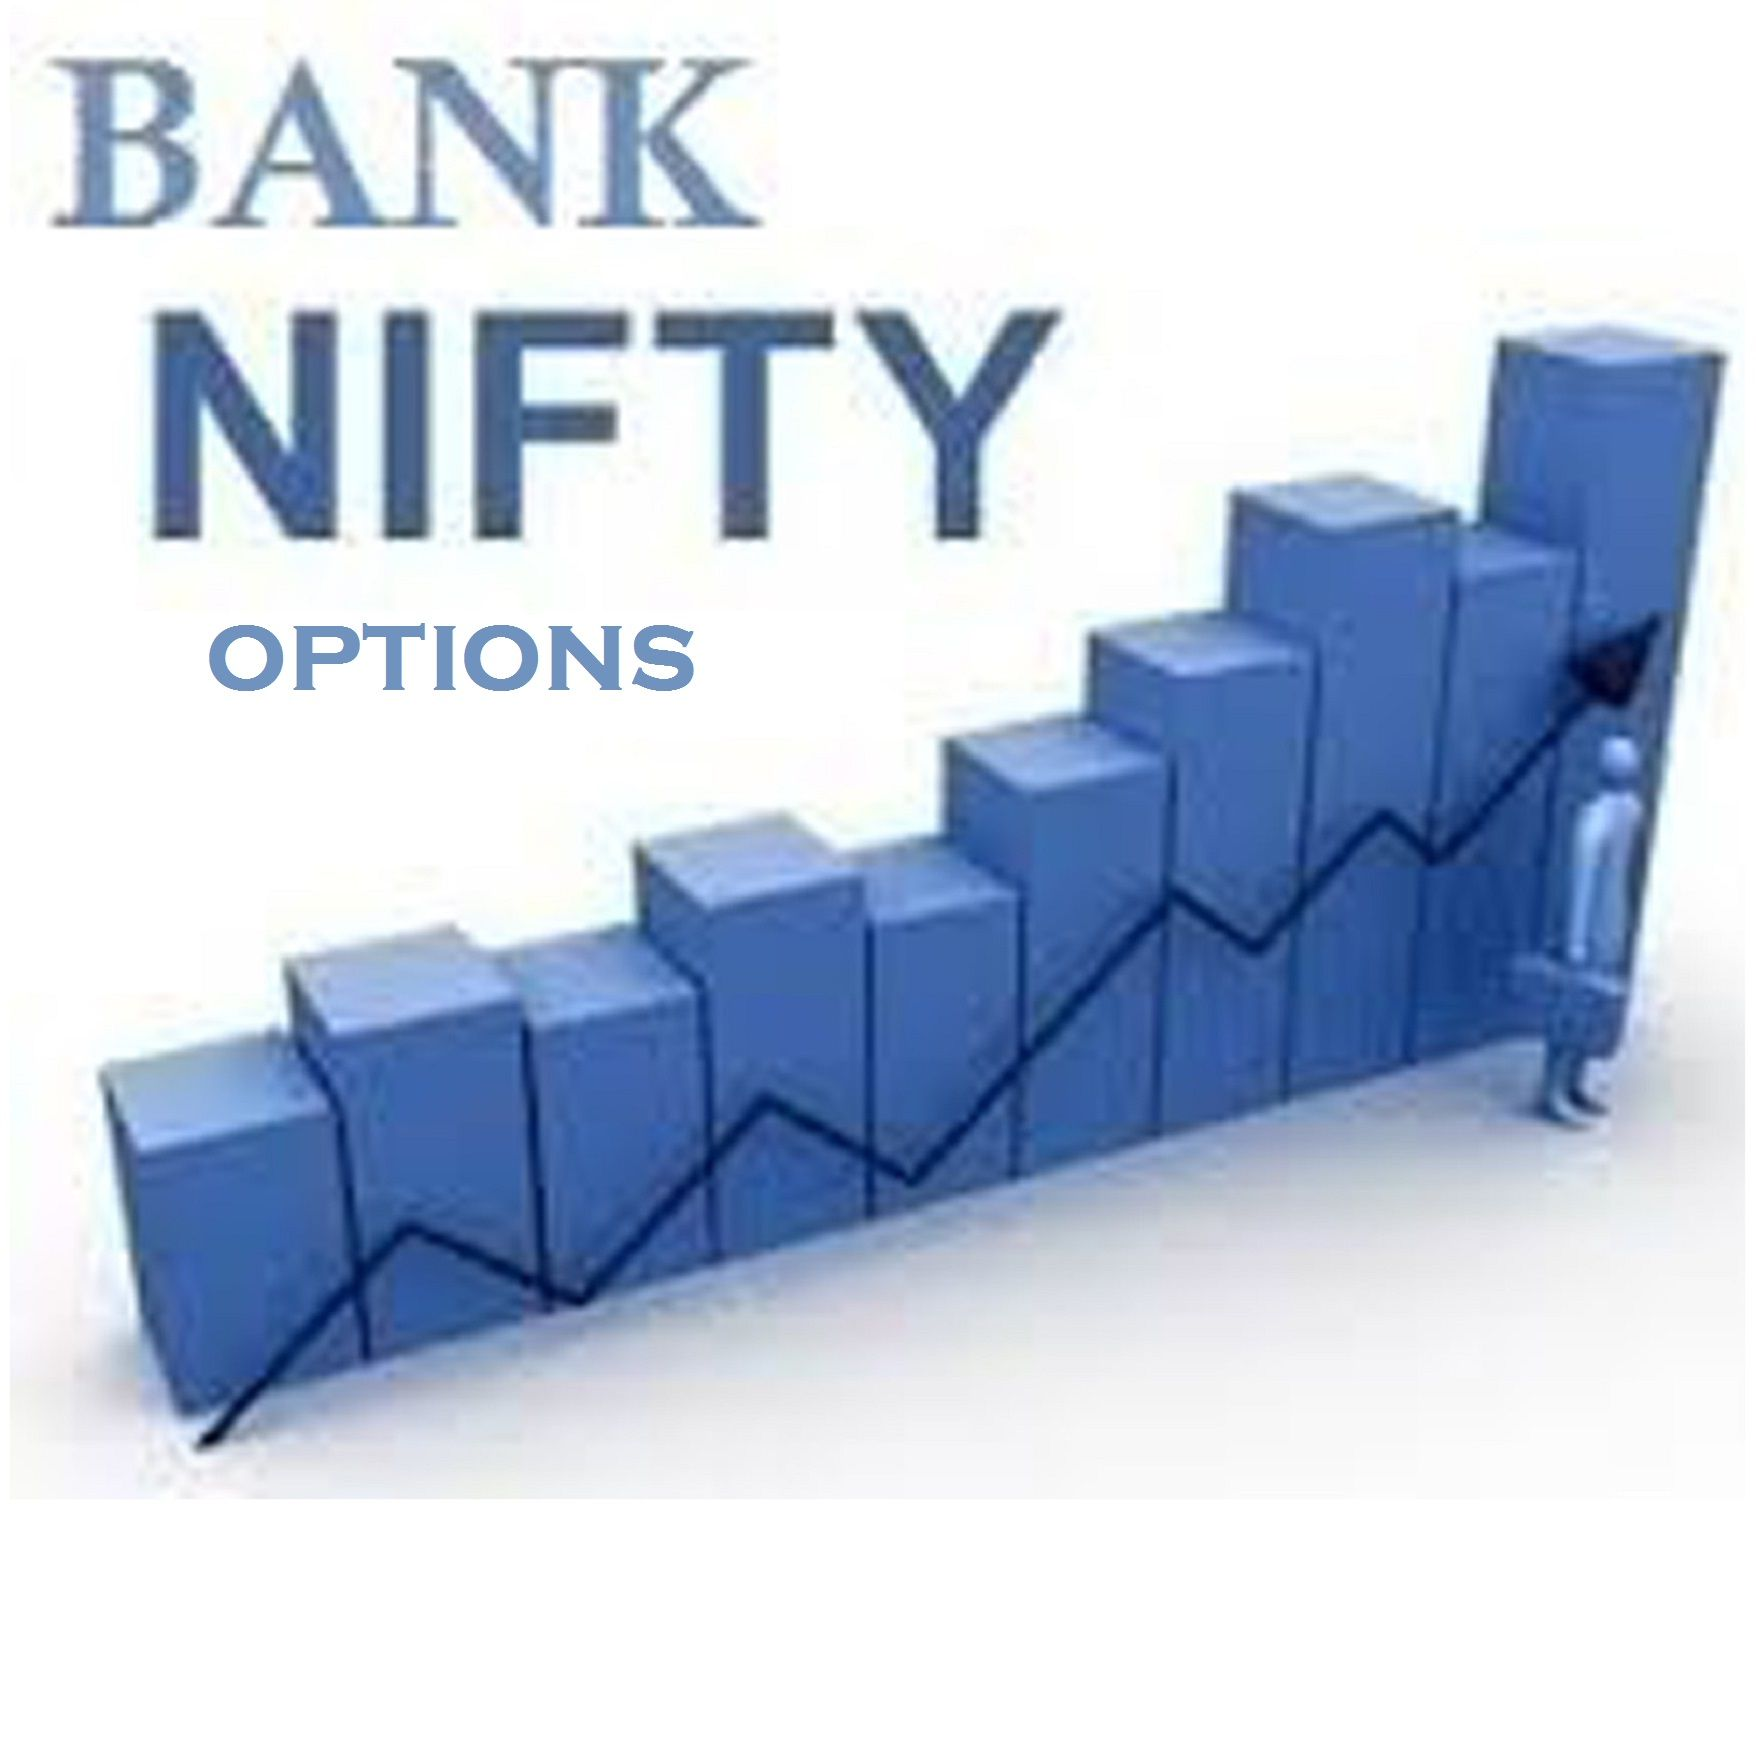 IR24 NIFTY OPTION PACK BUY BANK NIFTY 18700 PE ABOVE 210